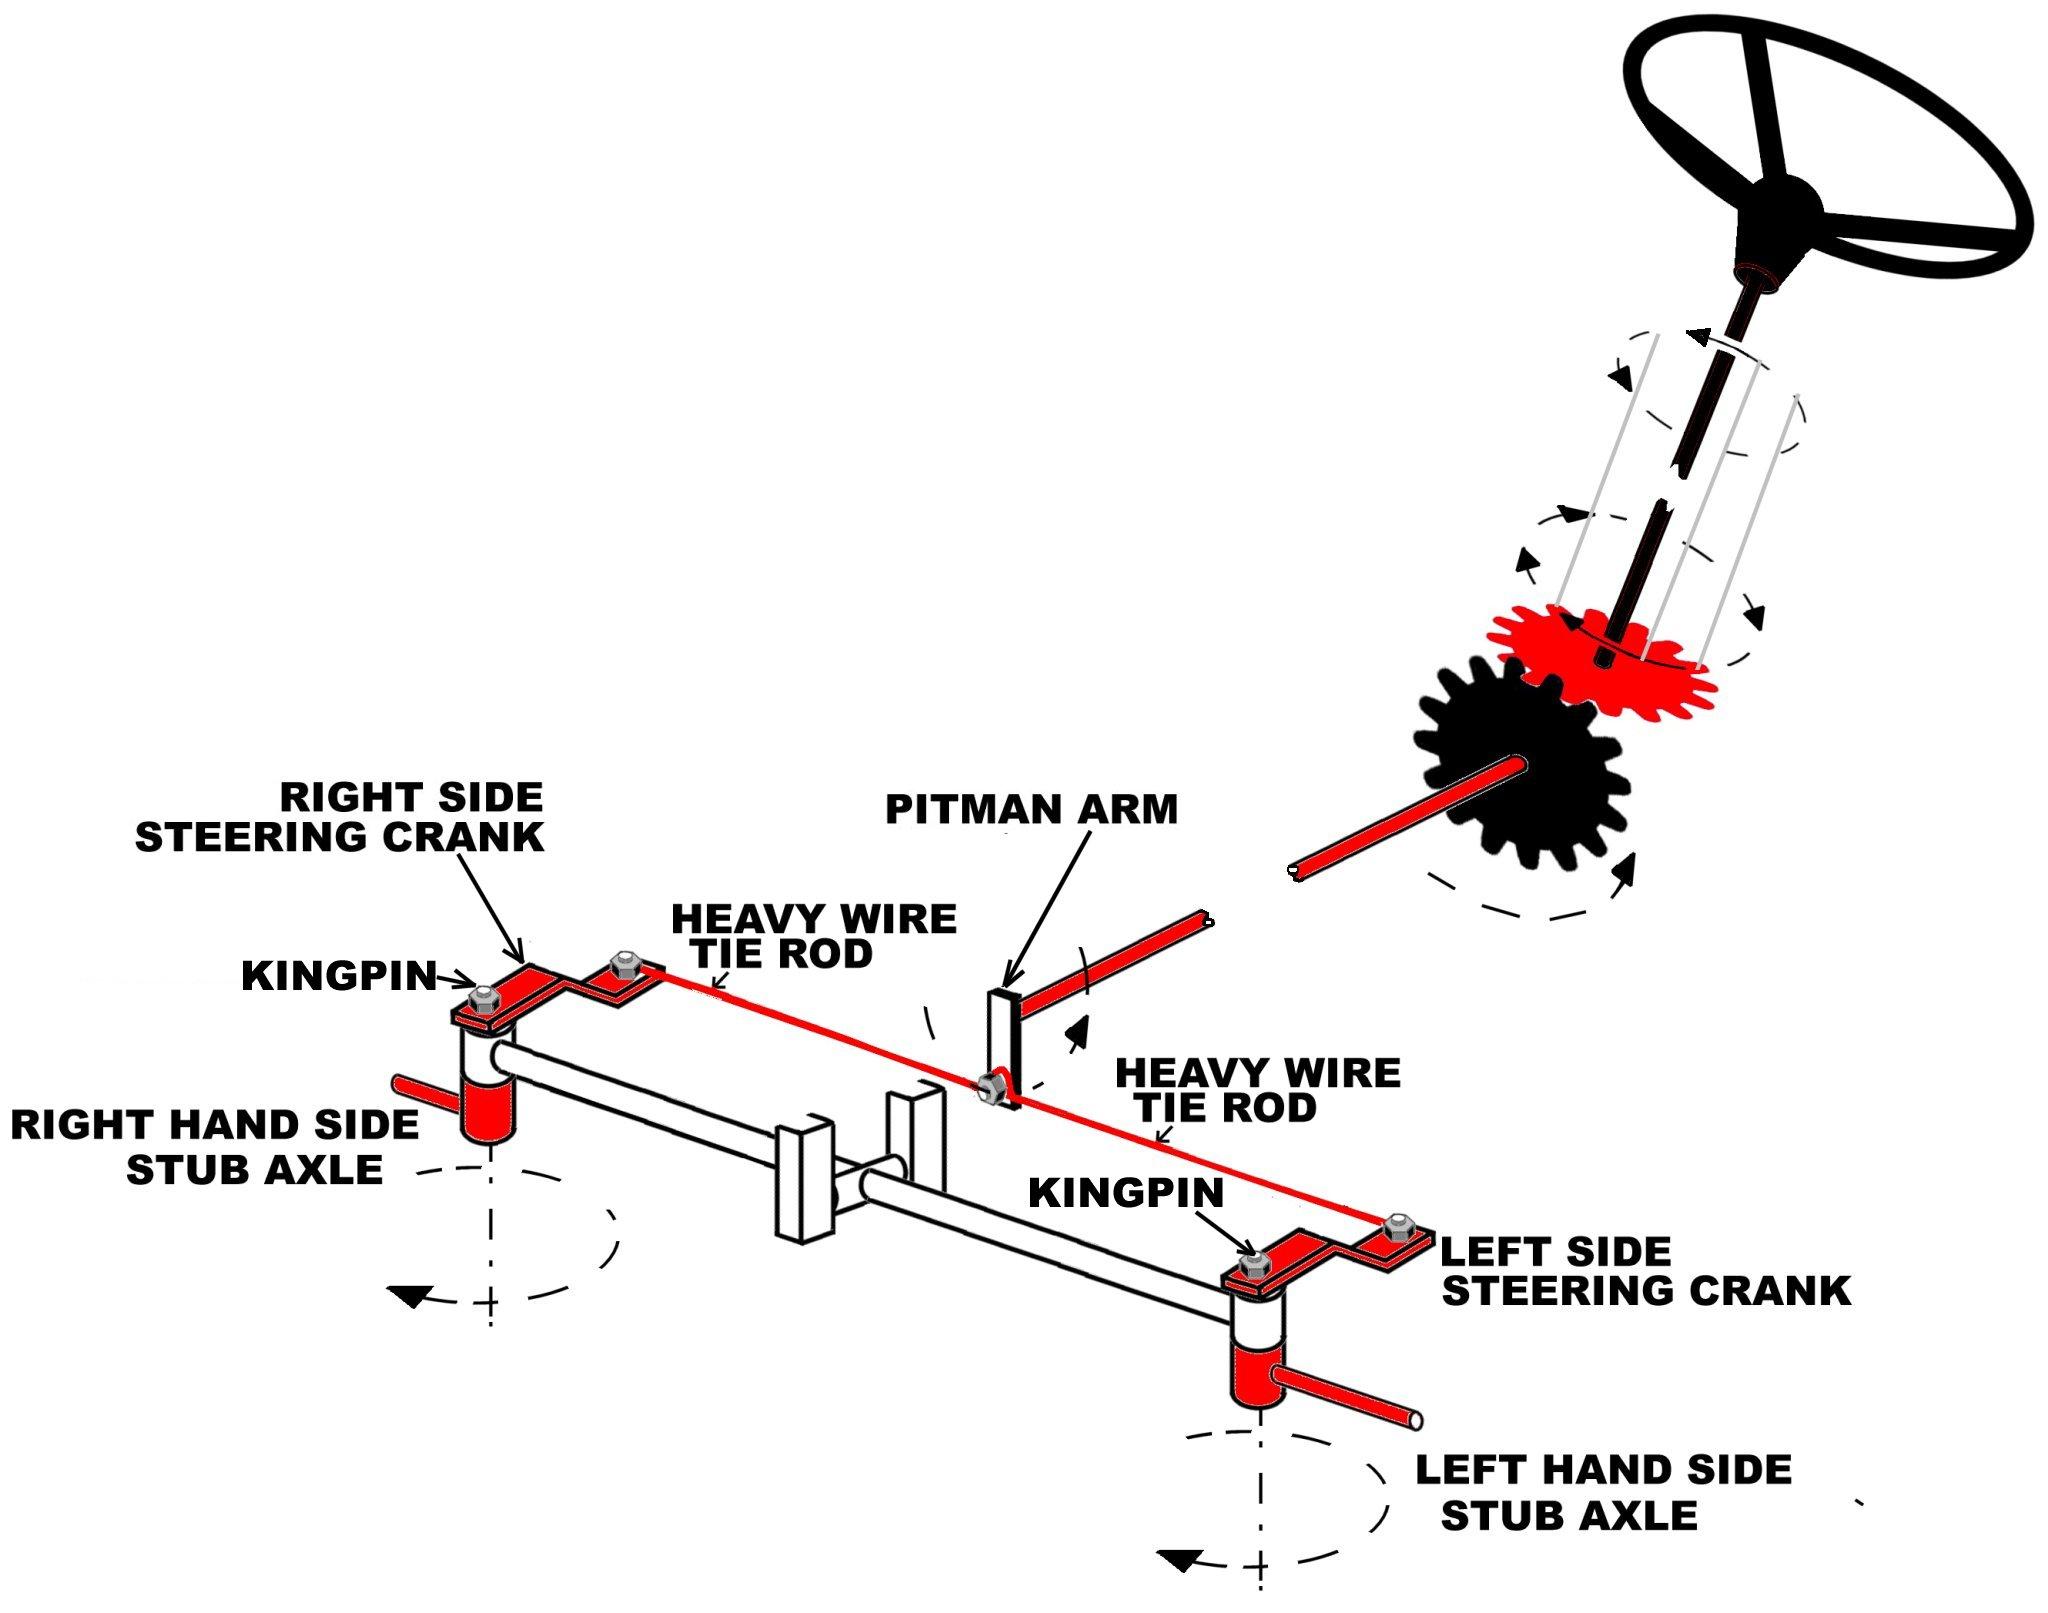 Tractor Steering Diagram : 24 Wiring Diagram Images